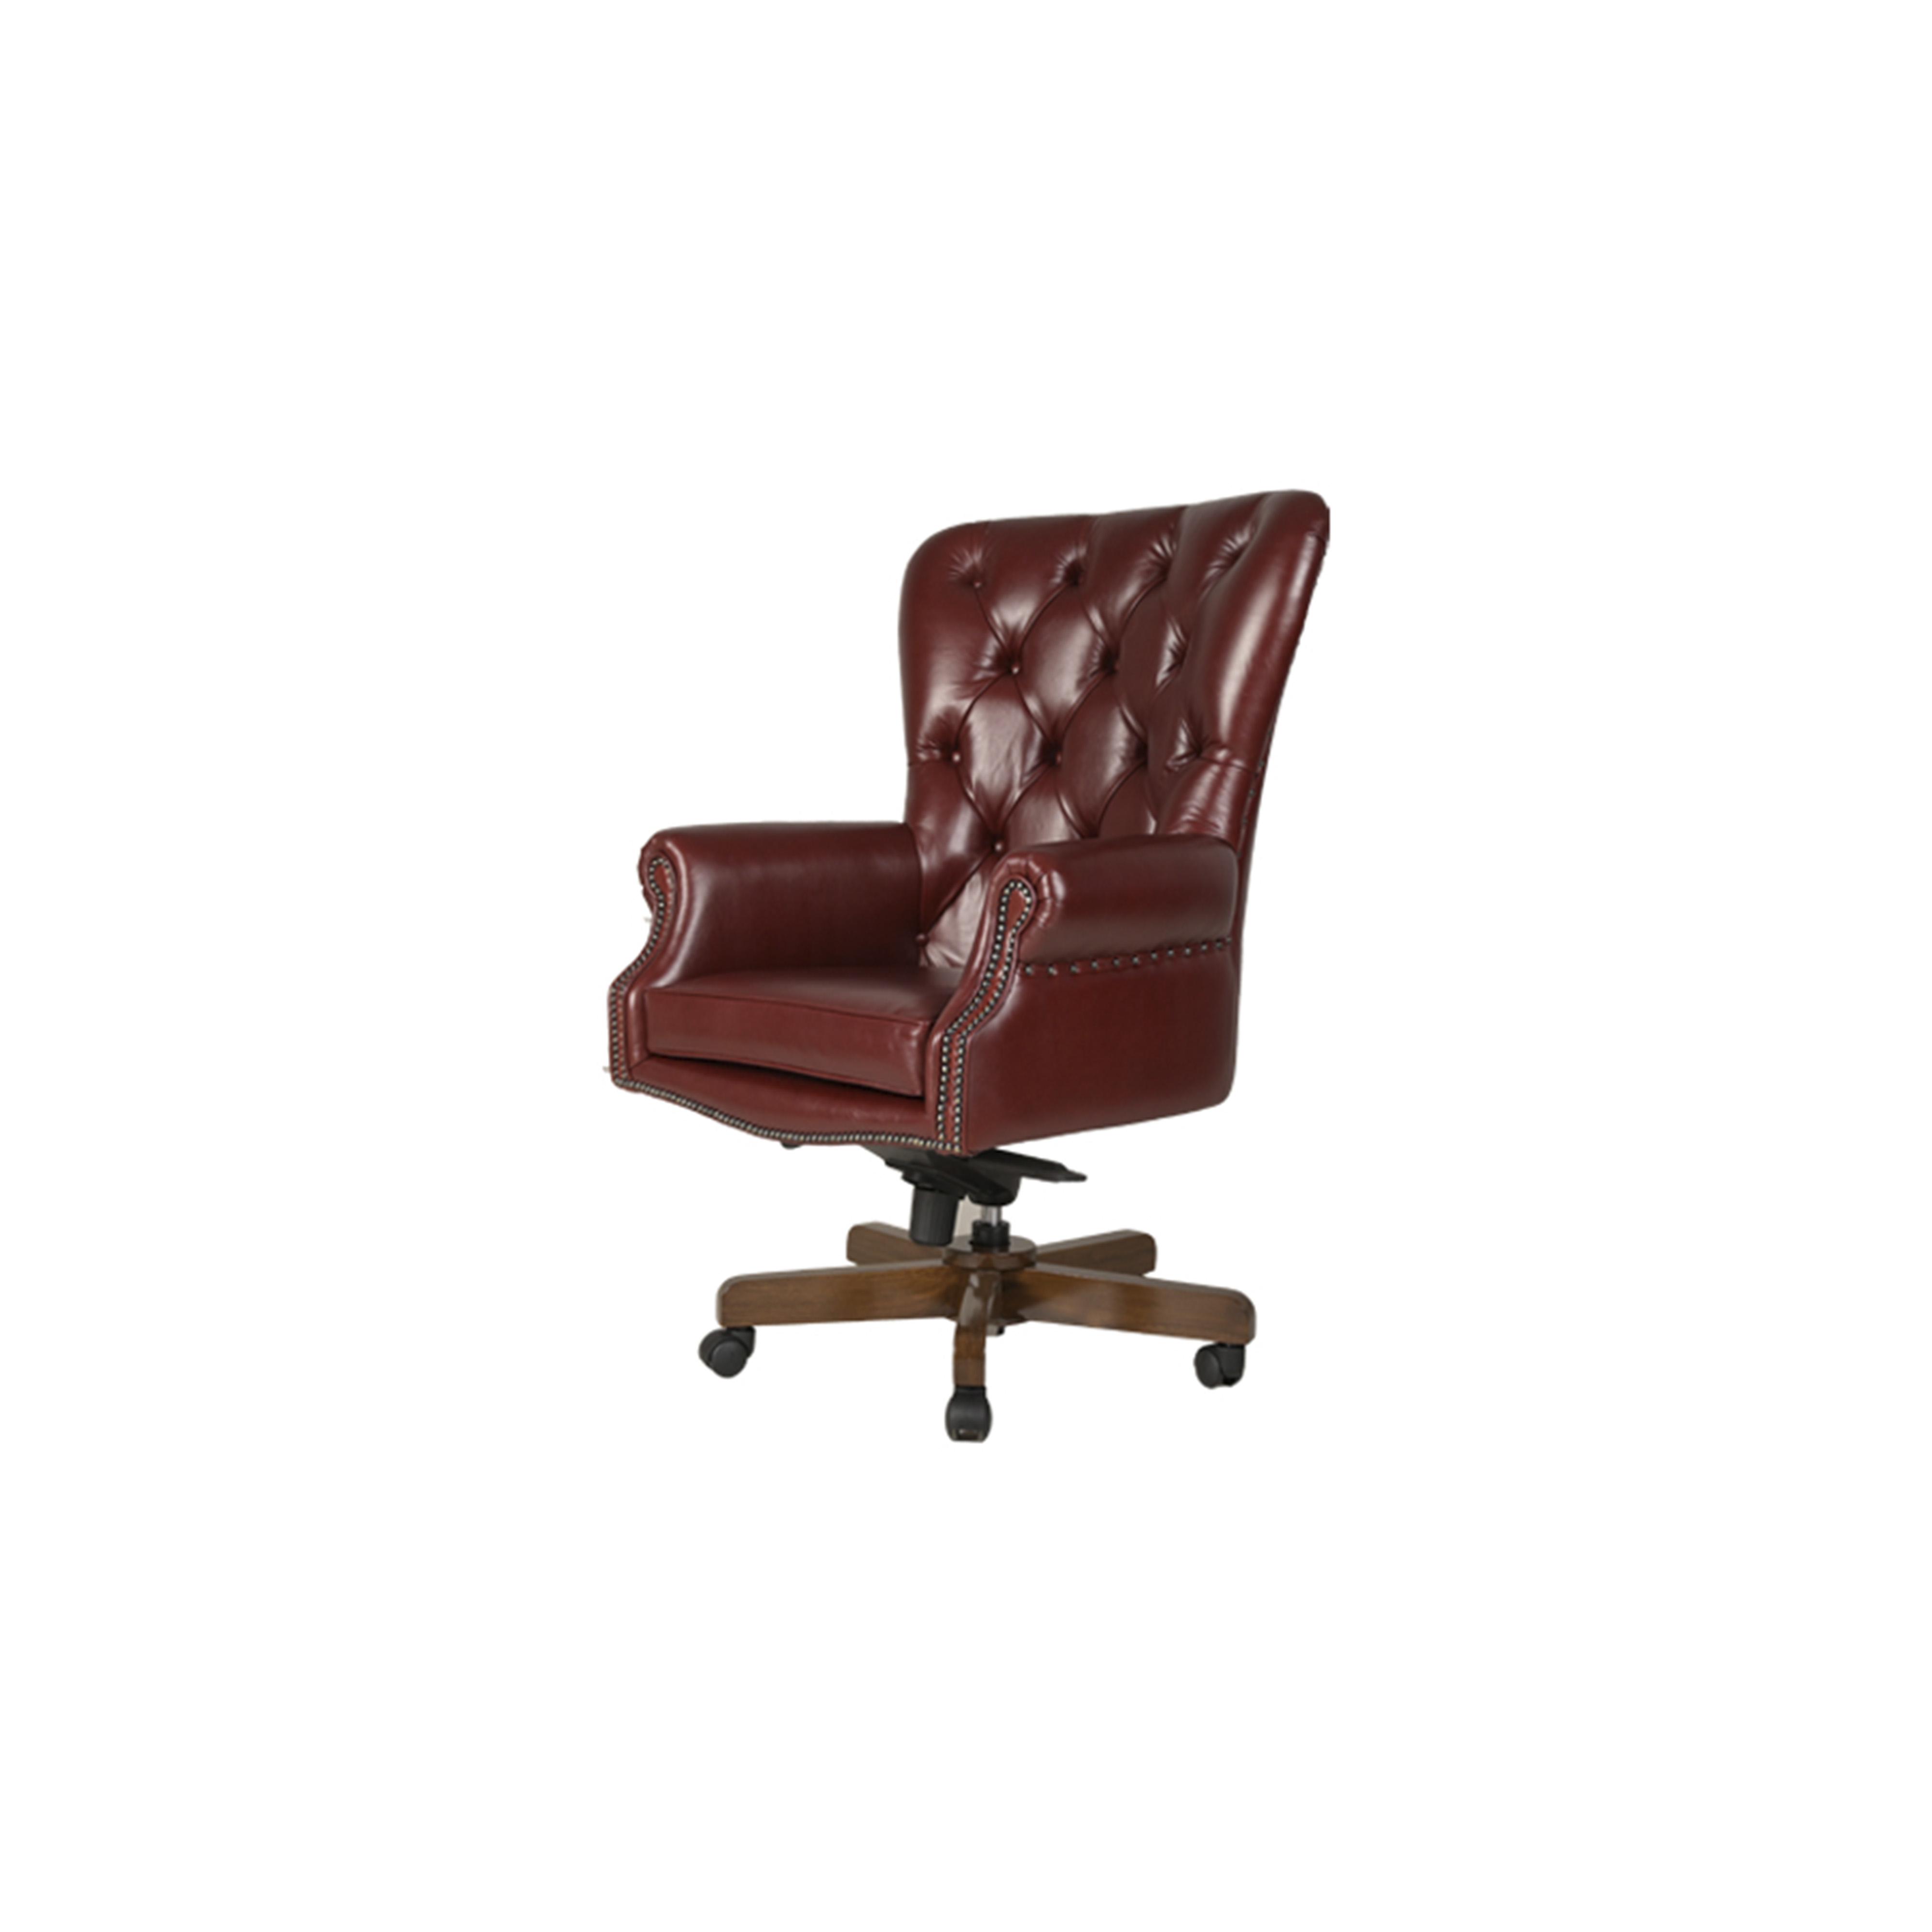 President swivel chair